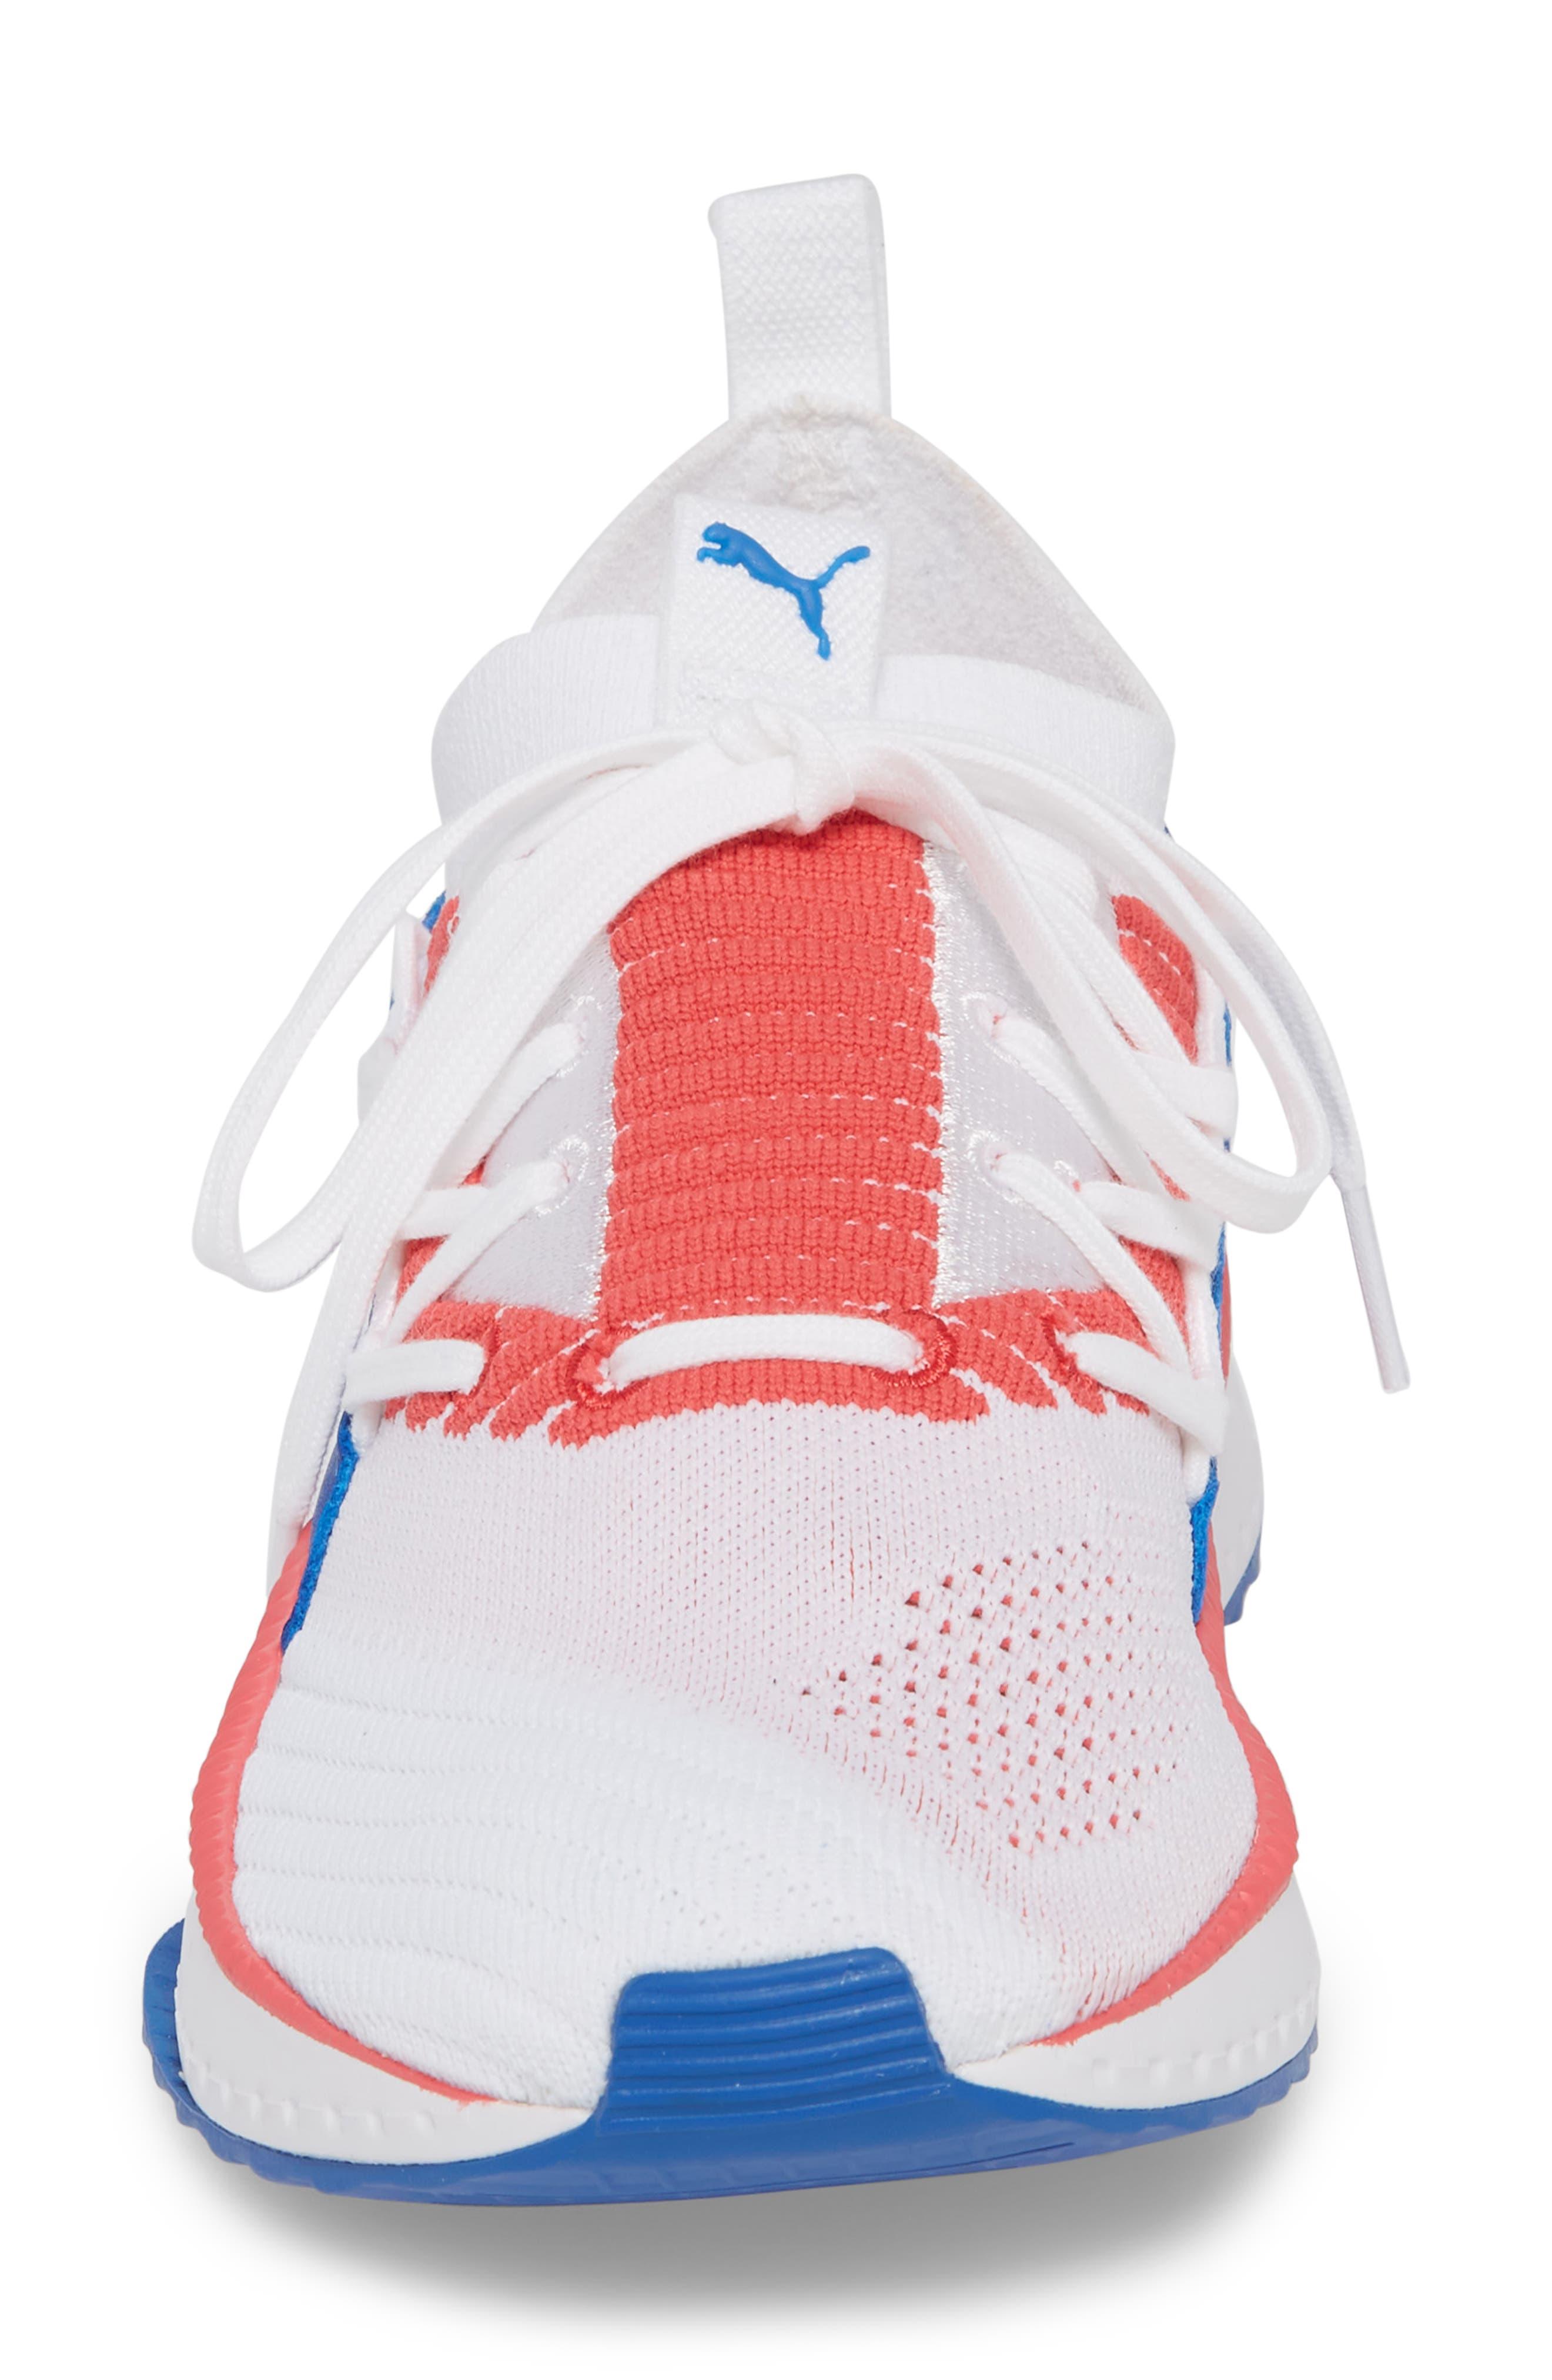 Tsugi Jun Knit Sneaker,                             Alternate thumbnail 27, color,